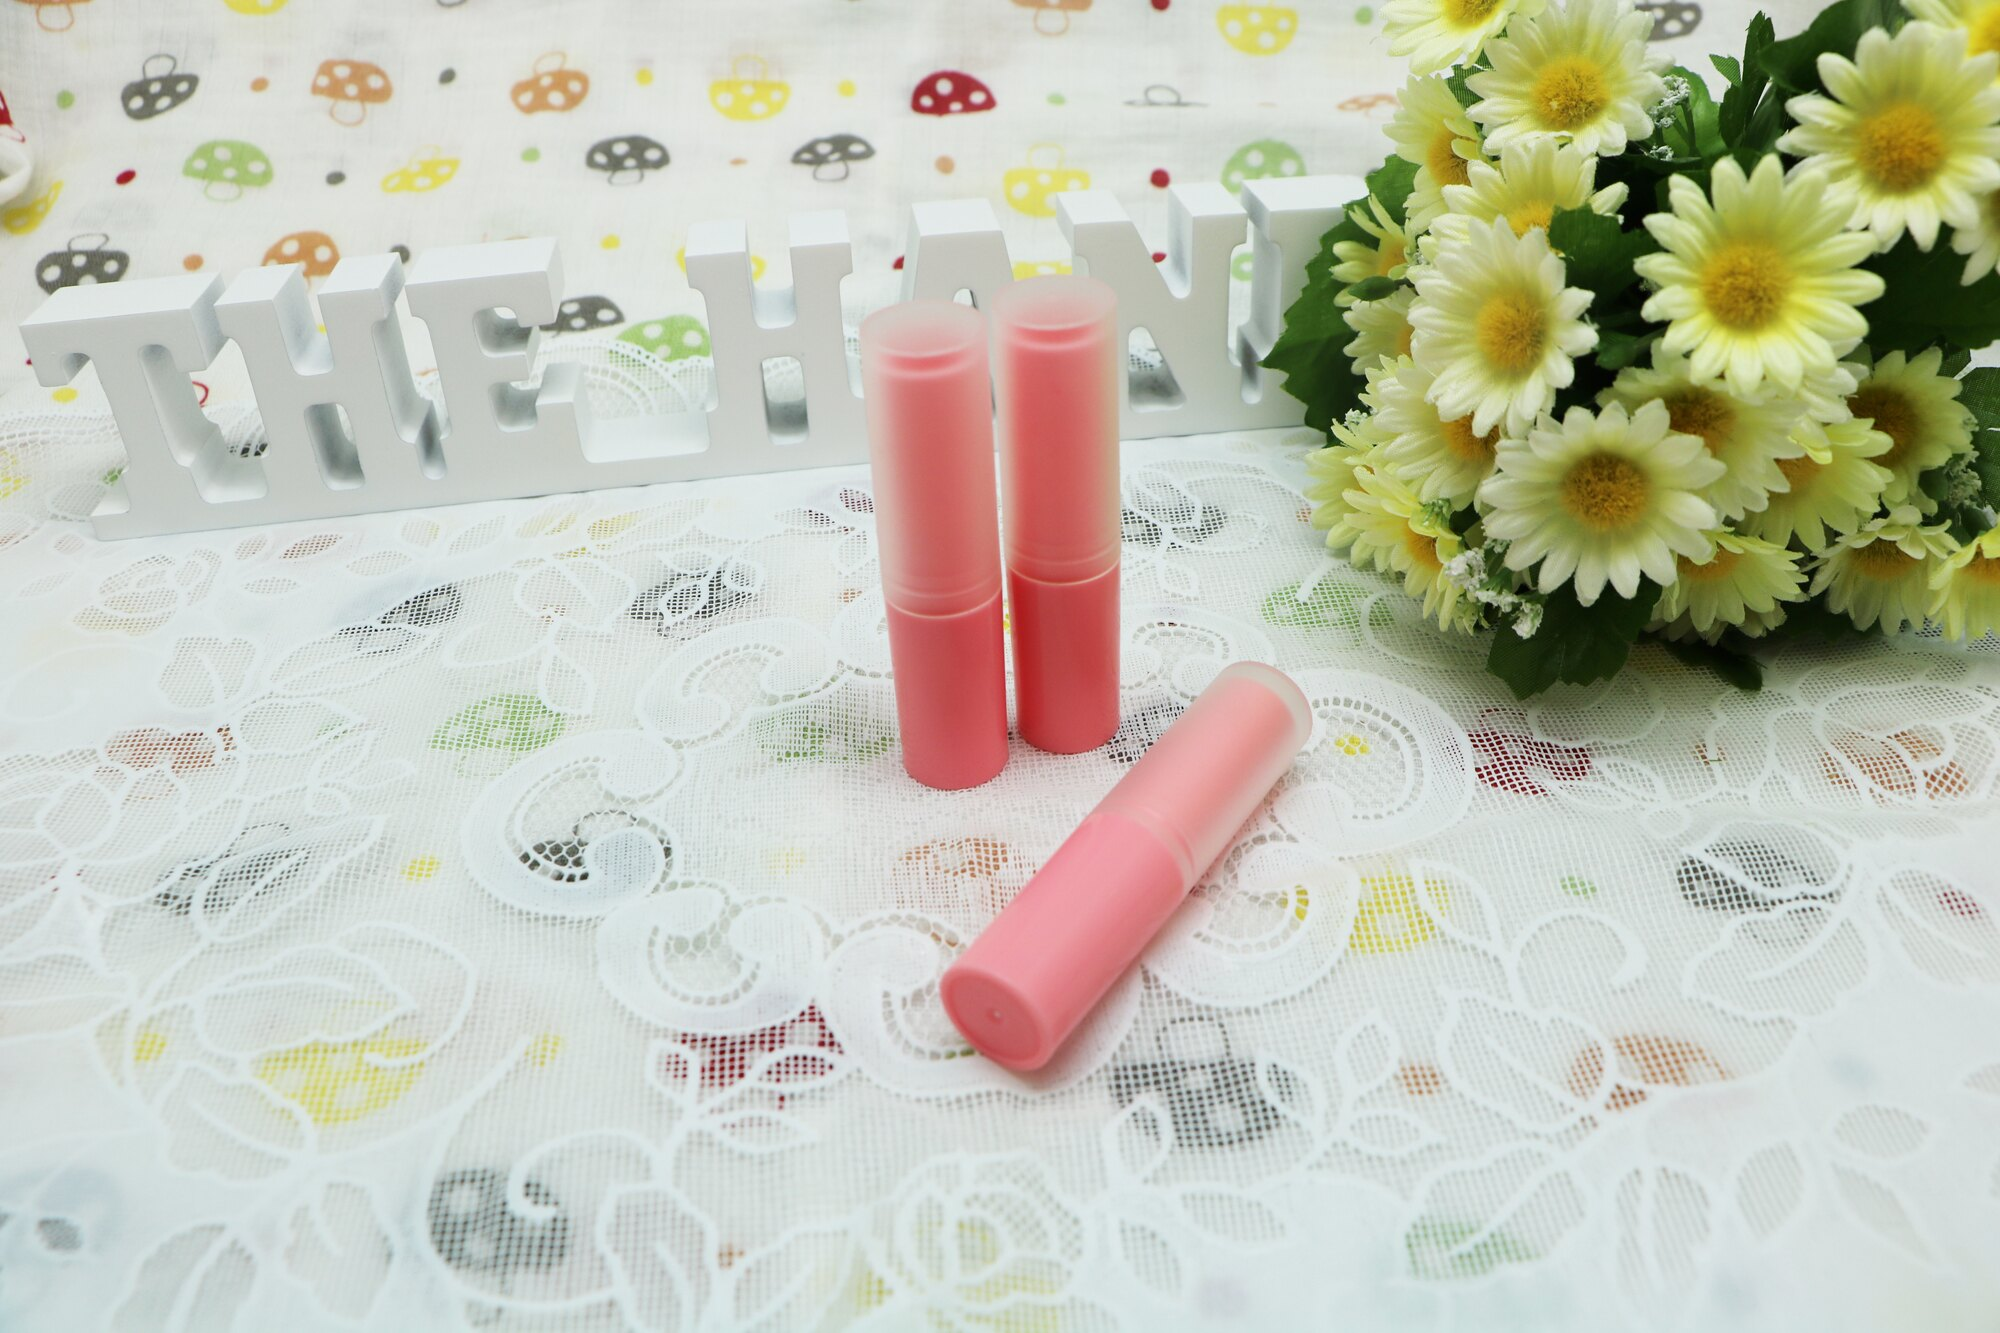 DIY 馬卡龍系粉紅色護唇膏管(3.5g)